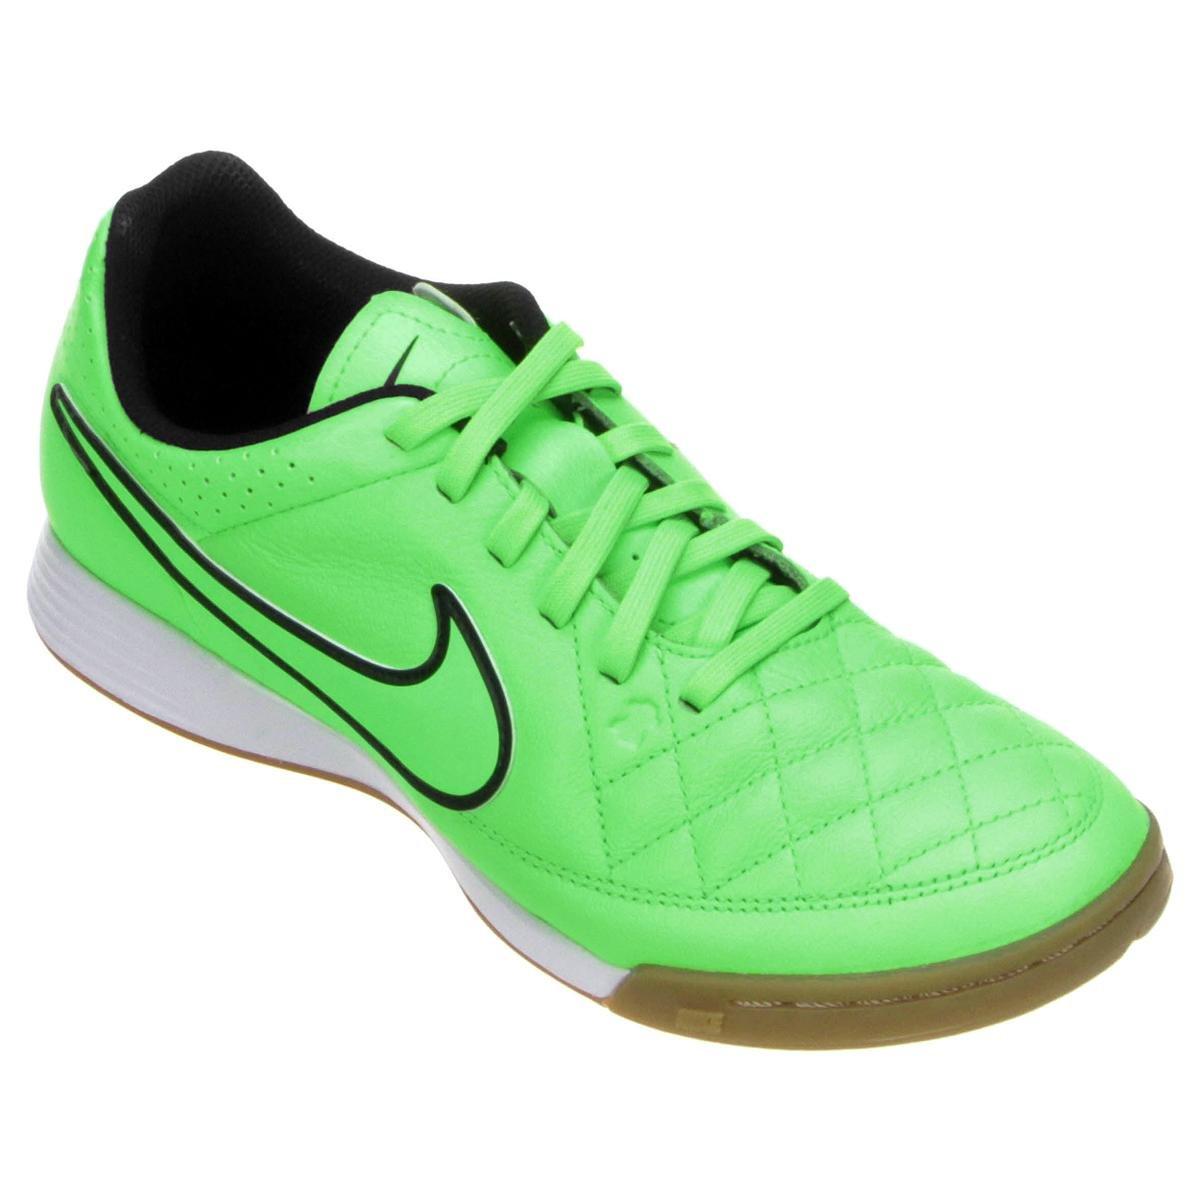 Libre Nike 5 0 Netshoes Crampons